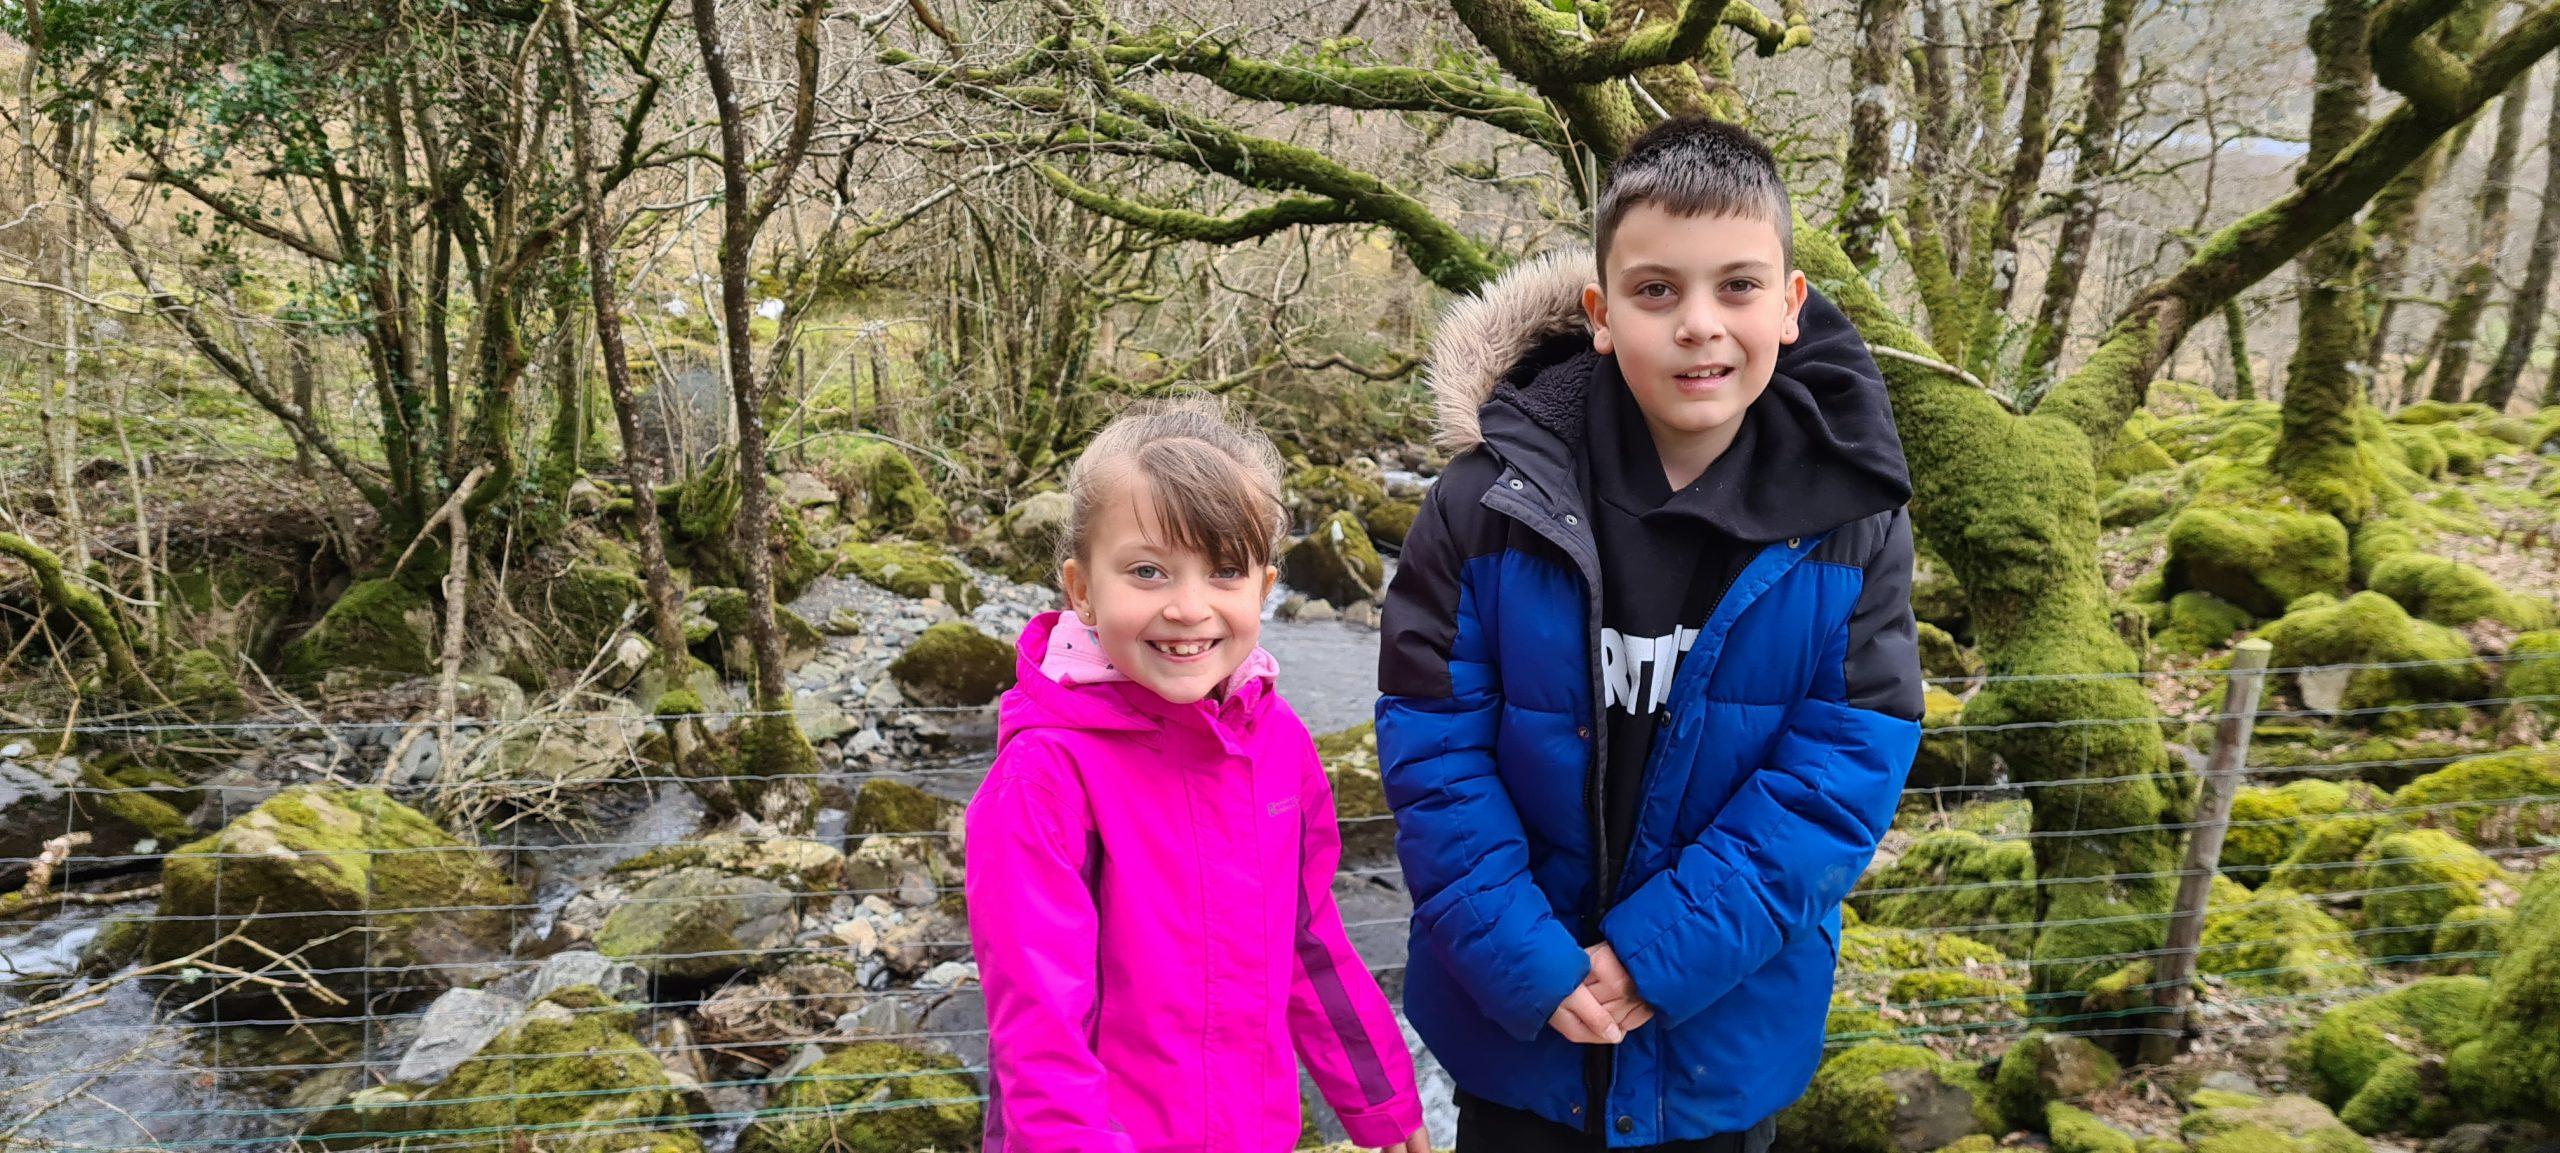 Lake to lake sponsored walk to celebrate Alfie's tenth birthday